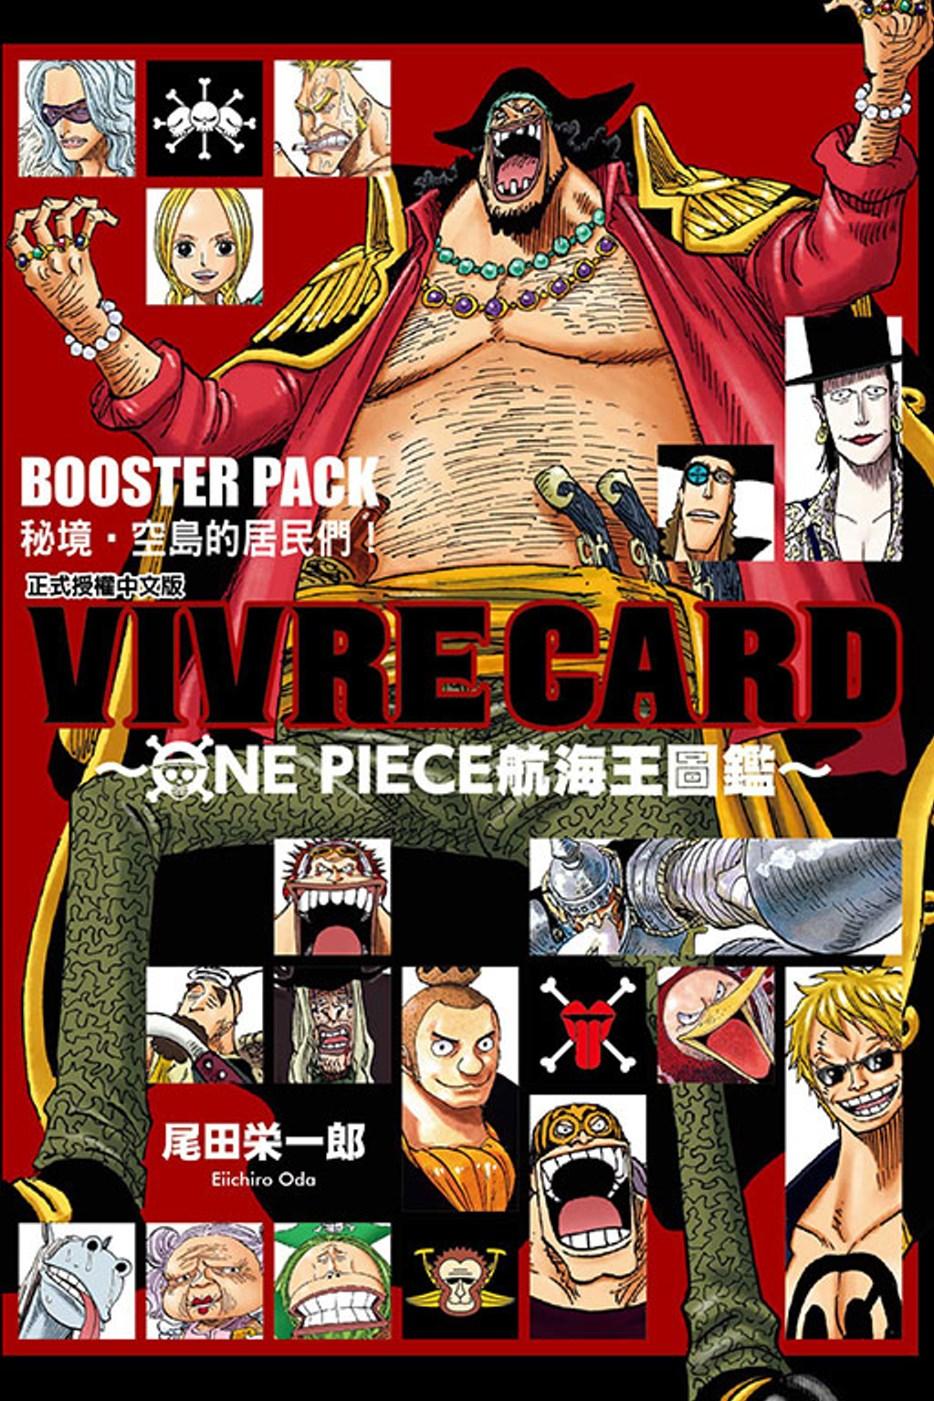 VIVRE CARD~ONE PIECE航海王圖鑑~ Ⅰ 10 秘境‧空島的居民們!